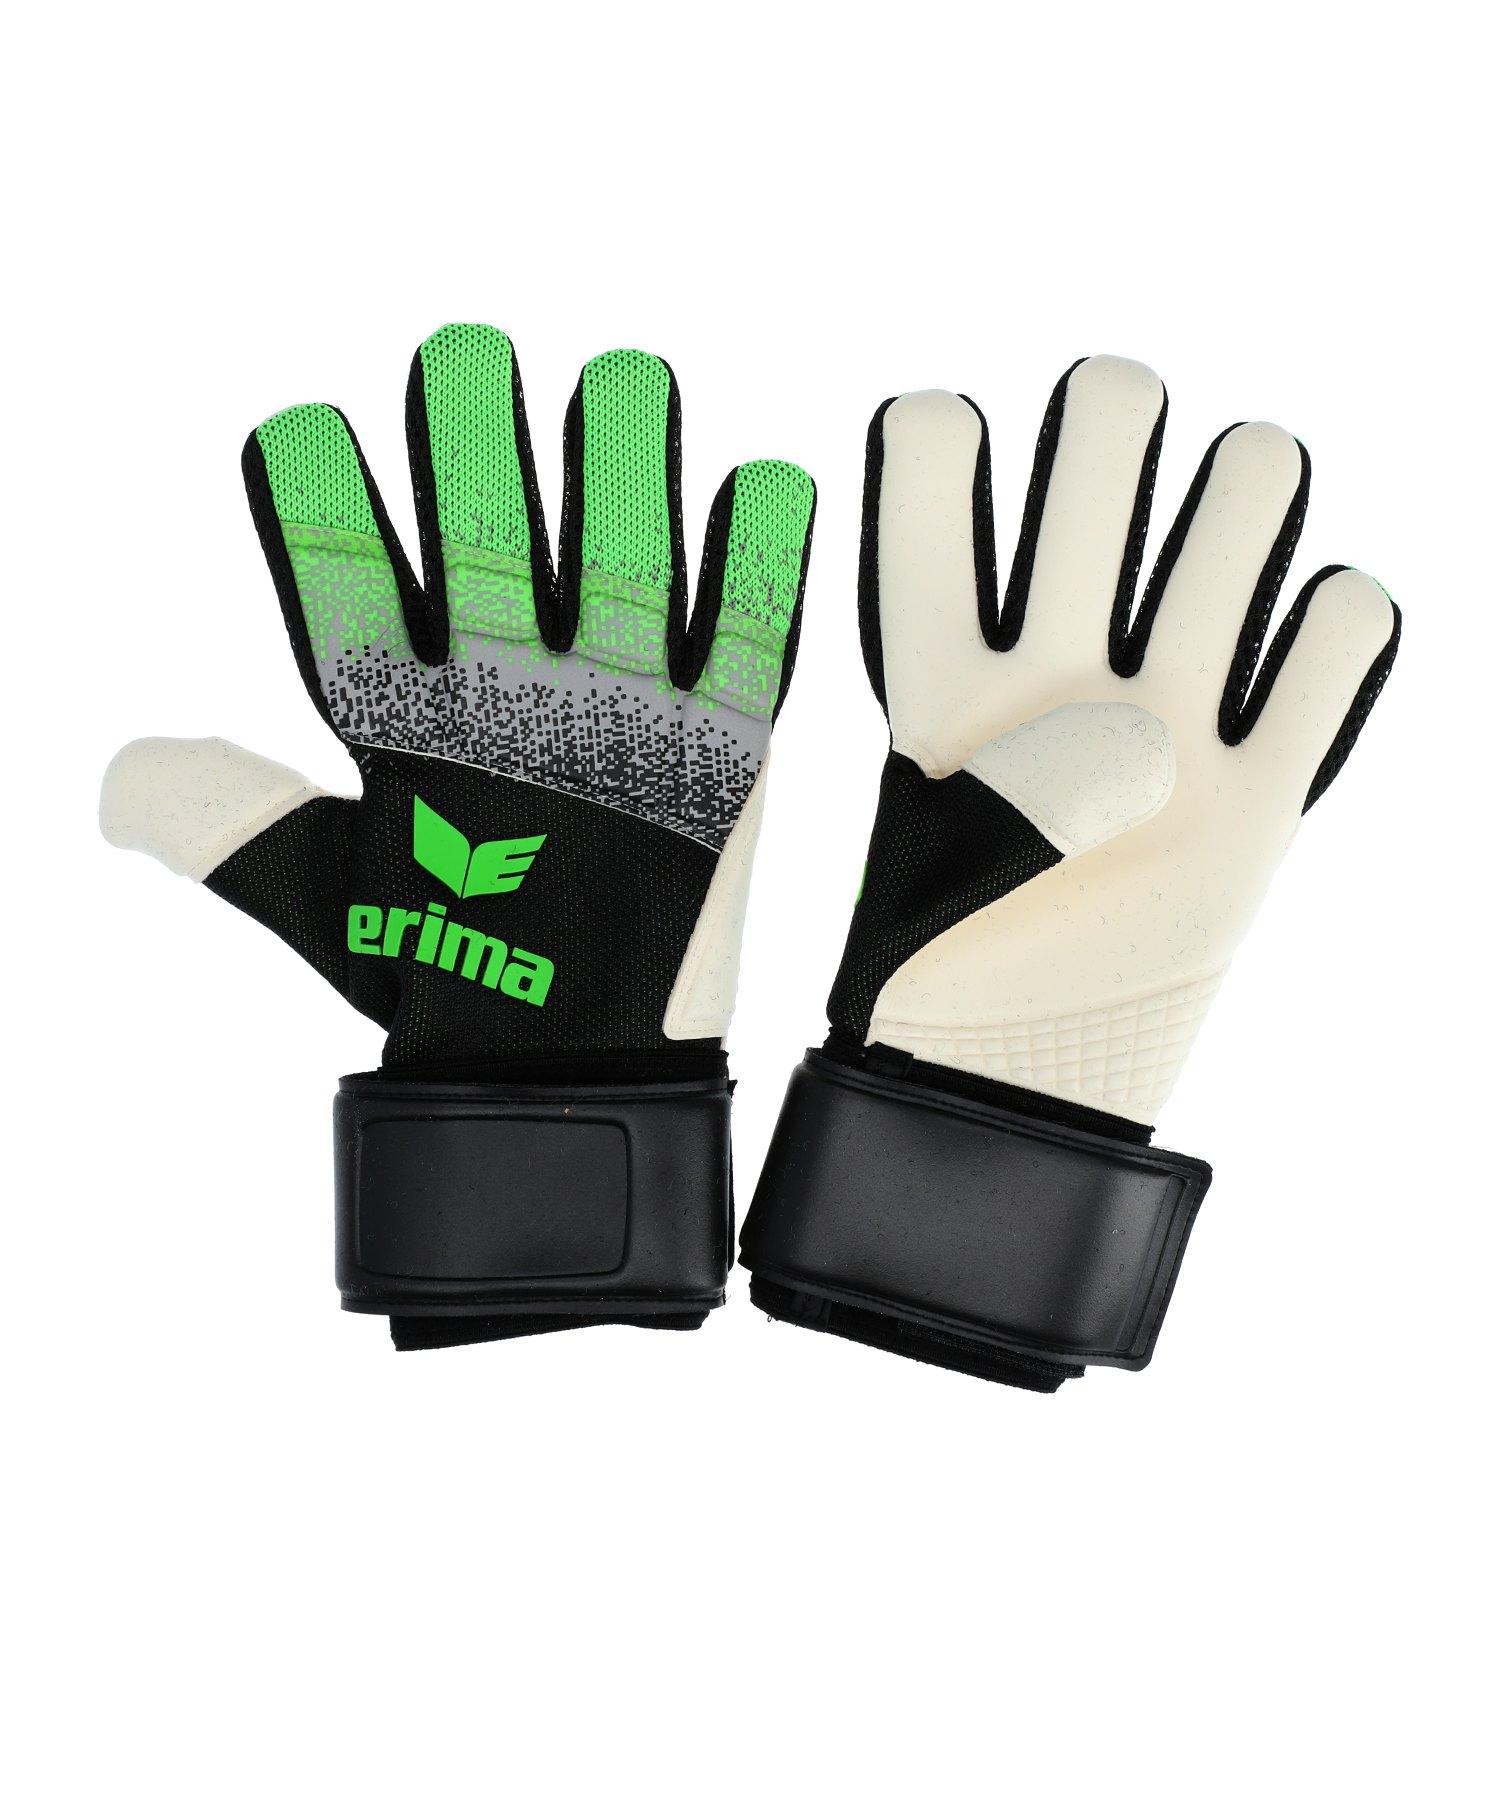 Erima Flexinator Knit TW-Handschuh Schwarz - schwarz